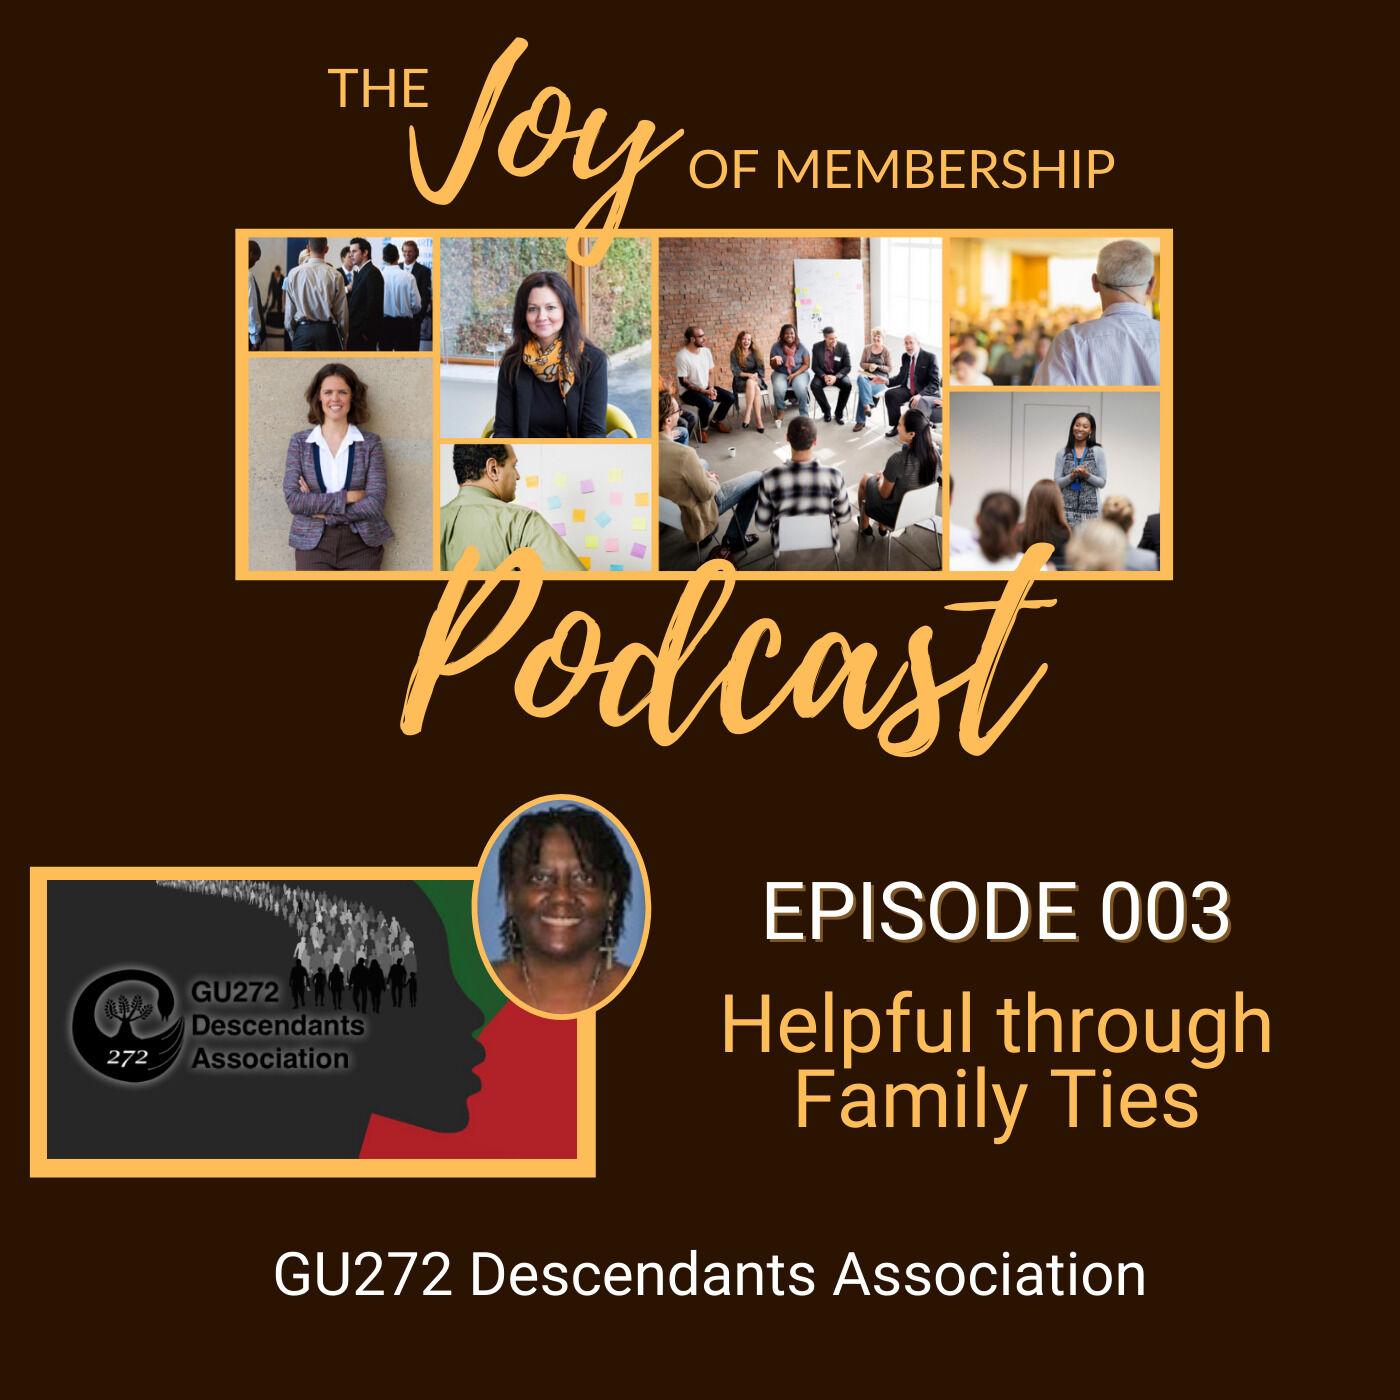 Helpful Through Family Ties: GU272 Descendants Association